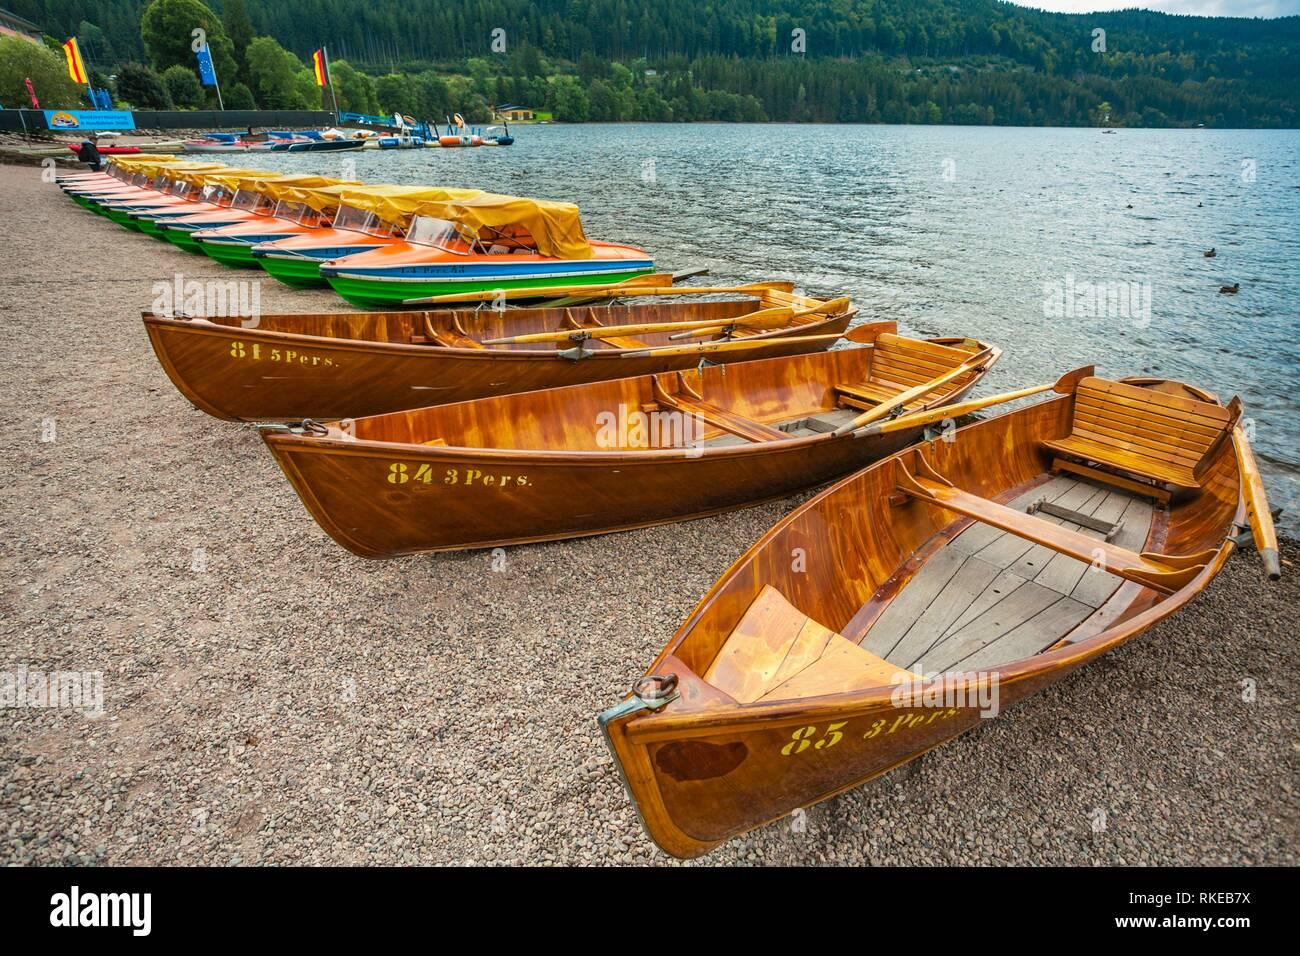 Embarcaciones de remo.el lago Titisee. Titisee. Titisee-Neustadt. Selva Negra. Baden Wurttemberg. Alemania. Europa Imagen De Stock